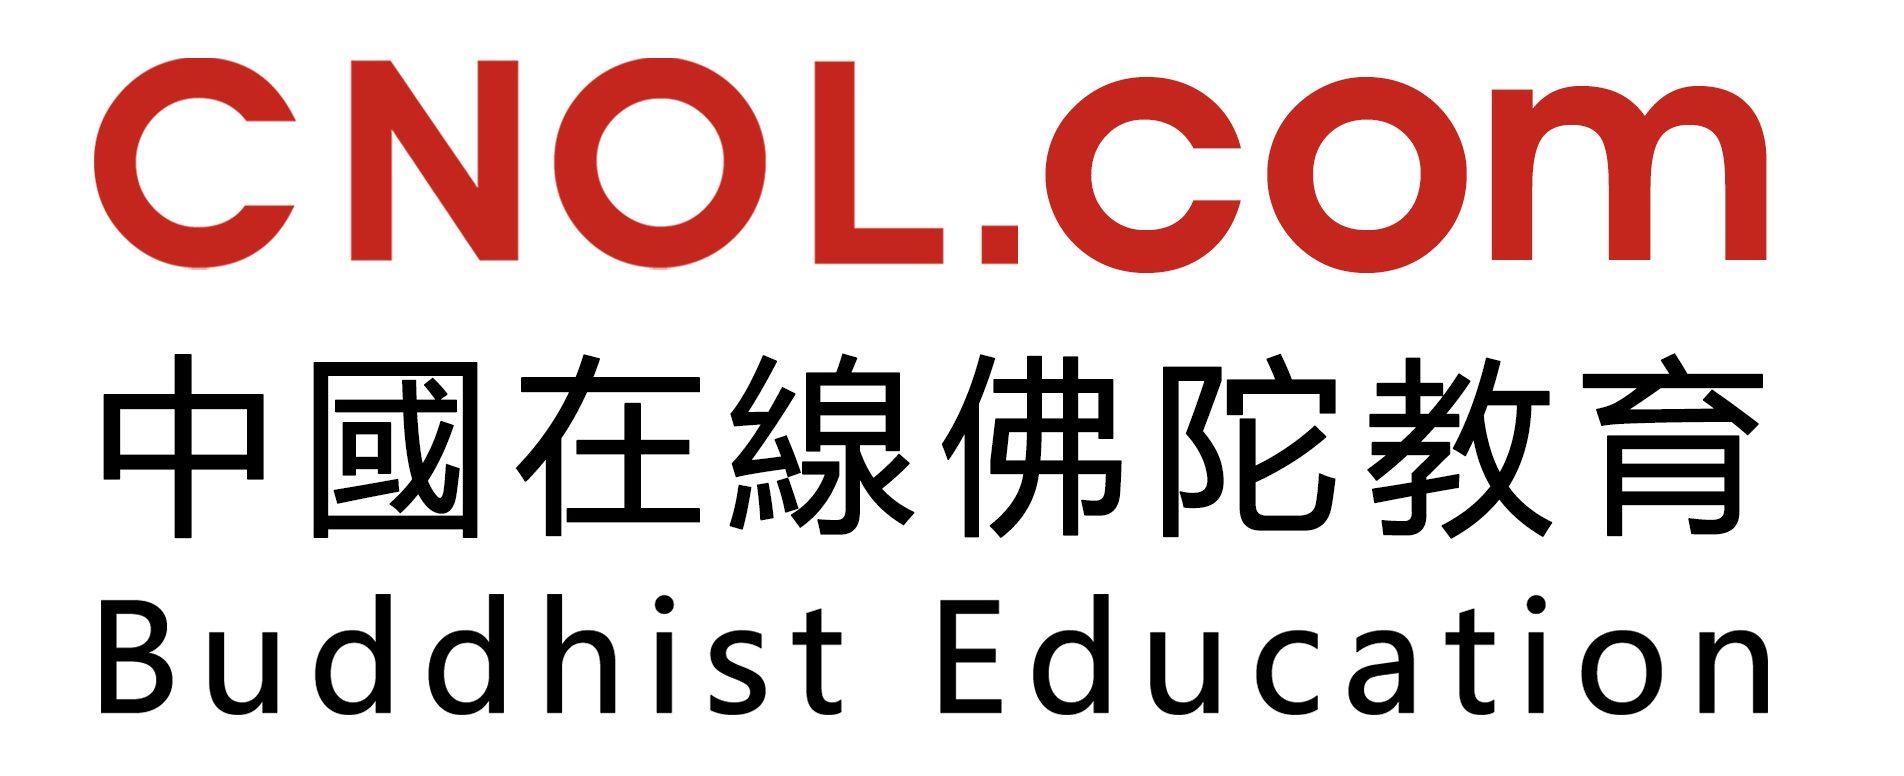 CNOL中國在線佛陀教育 Buddhist Education